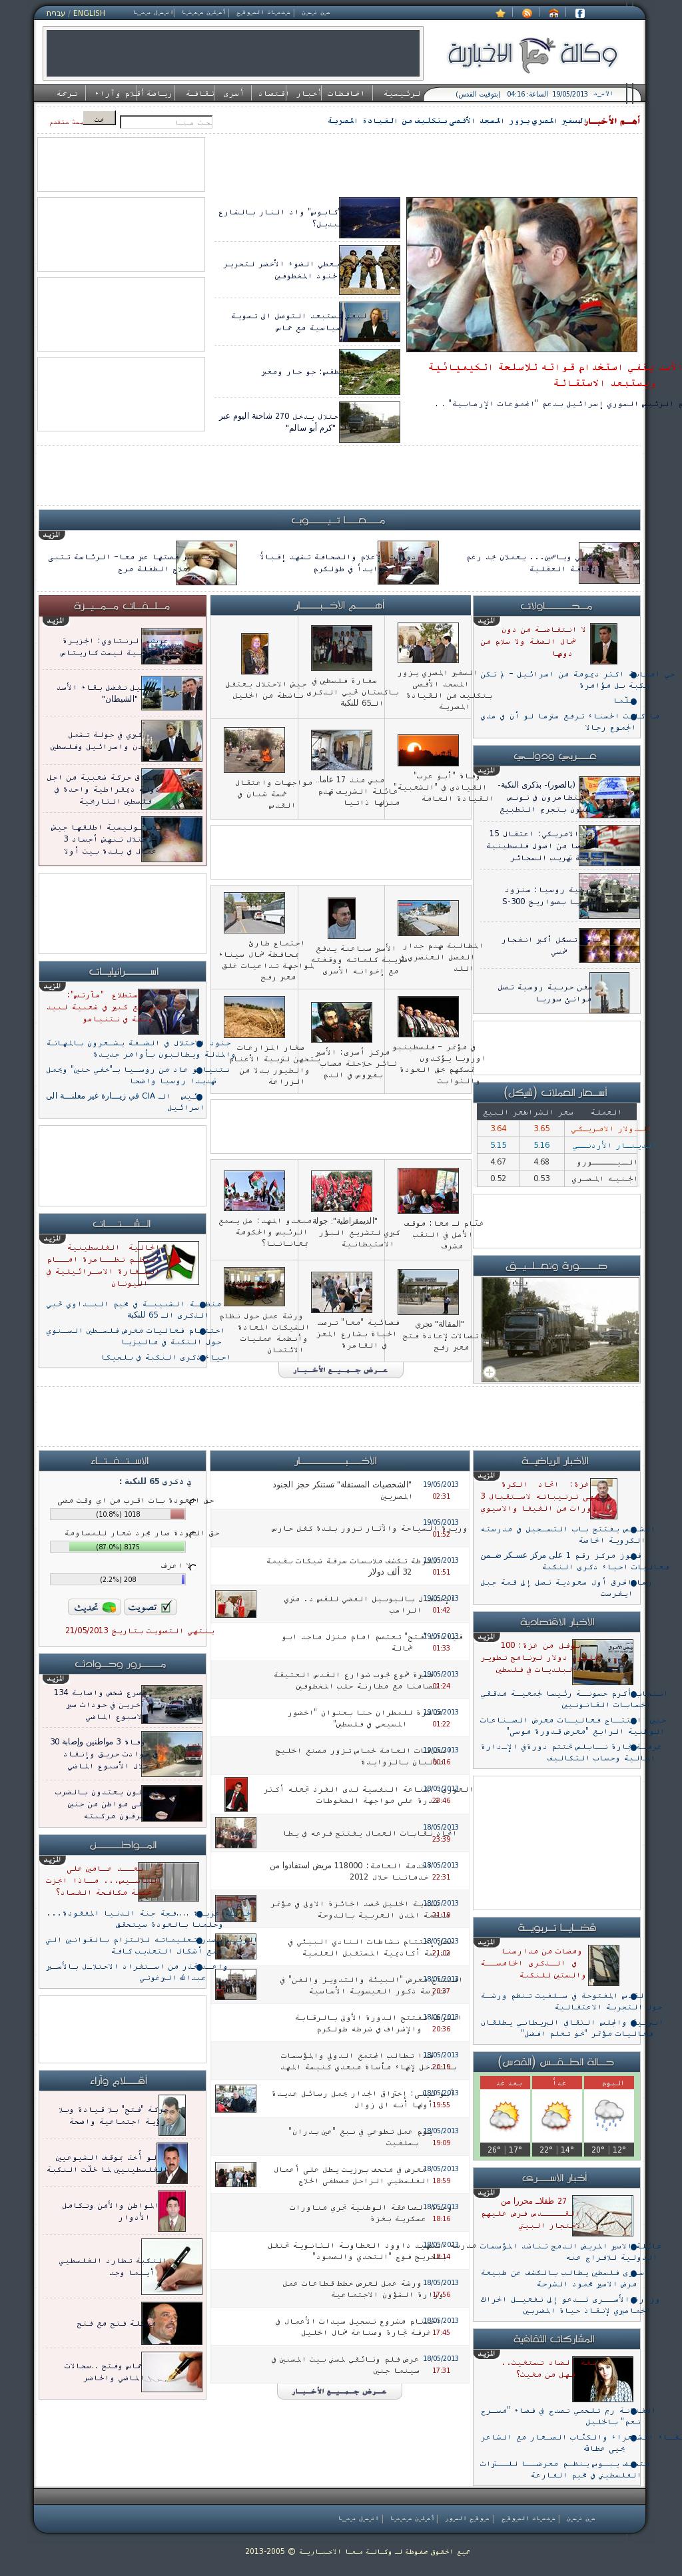 Ma'an News at Sunday May 19, 2013, 1:17 a.m. UTC